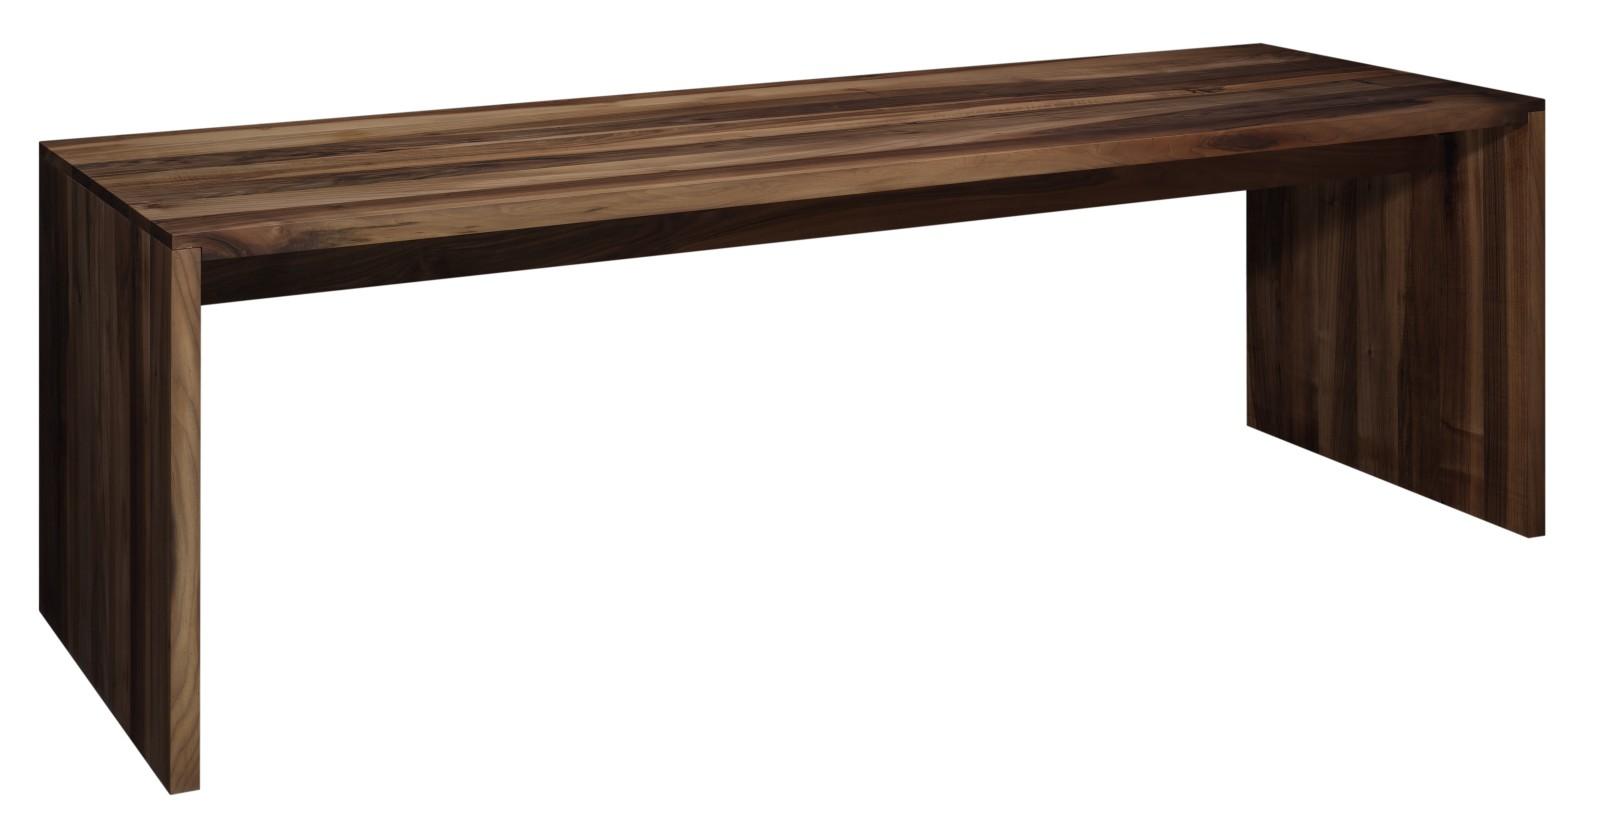 Ponte Table European Walnut, Oiled, 300, 92